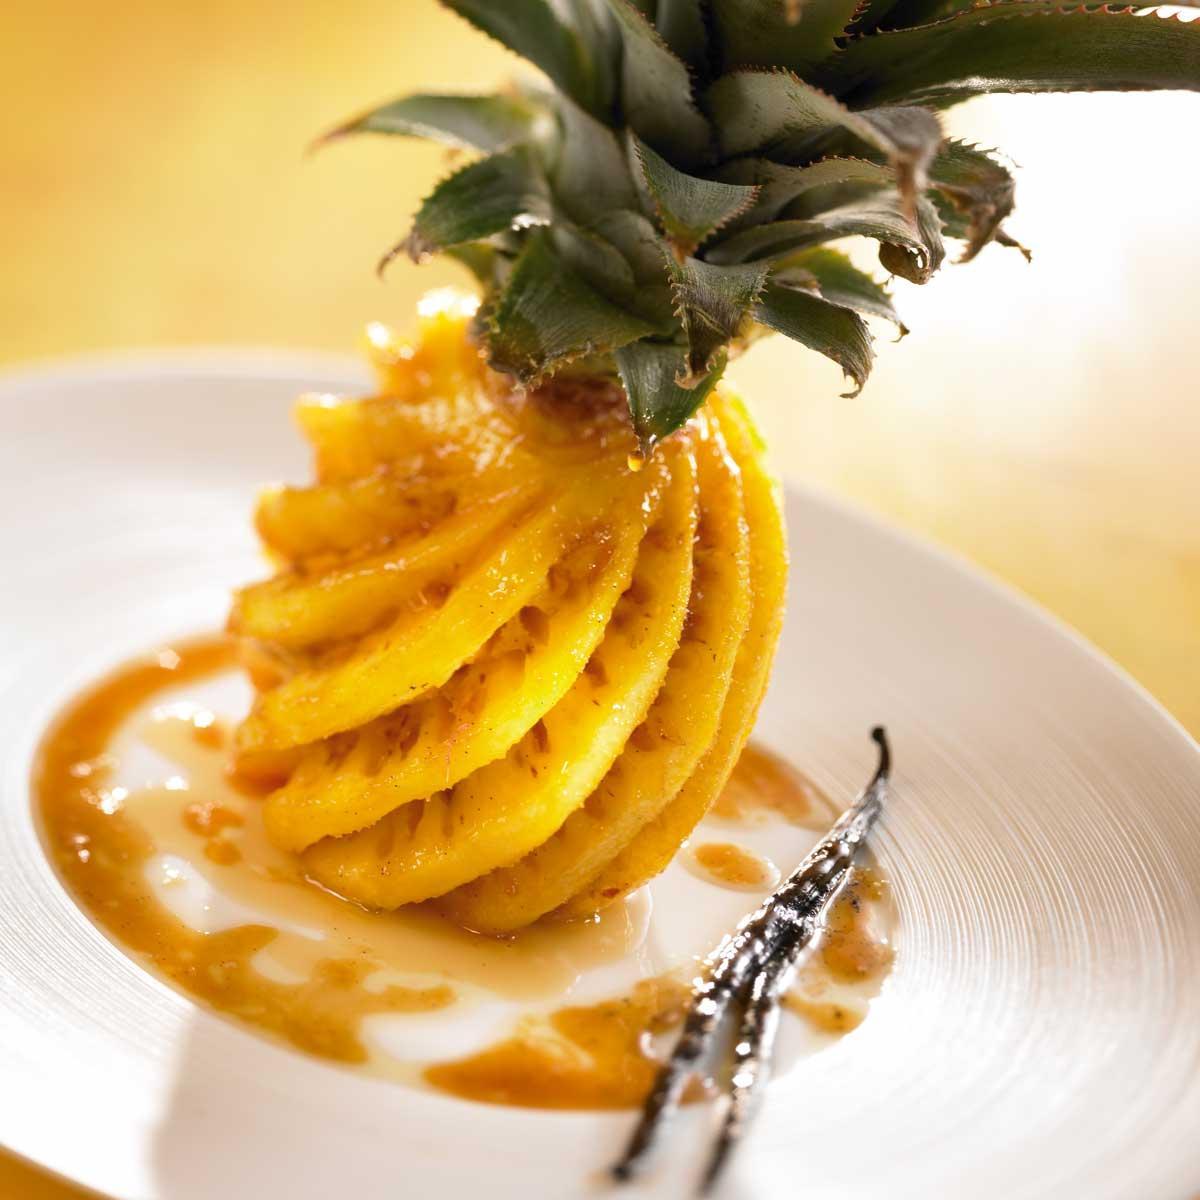 recette ananas r ti au beurre vanill cuisine madame figaro. Black Bedroom Furniture Sets. Home Design Ideas